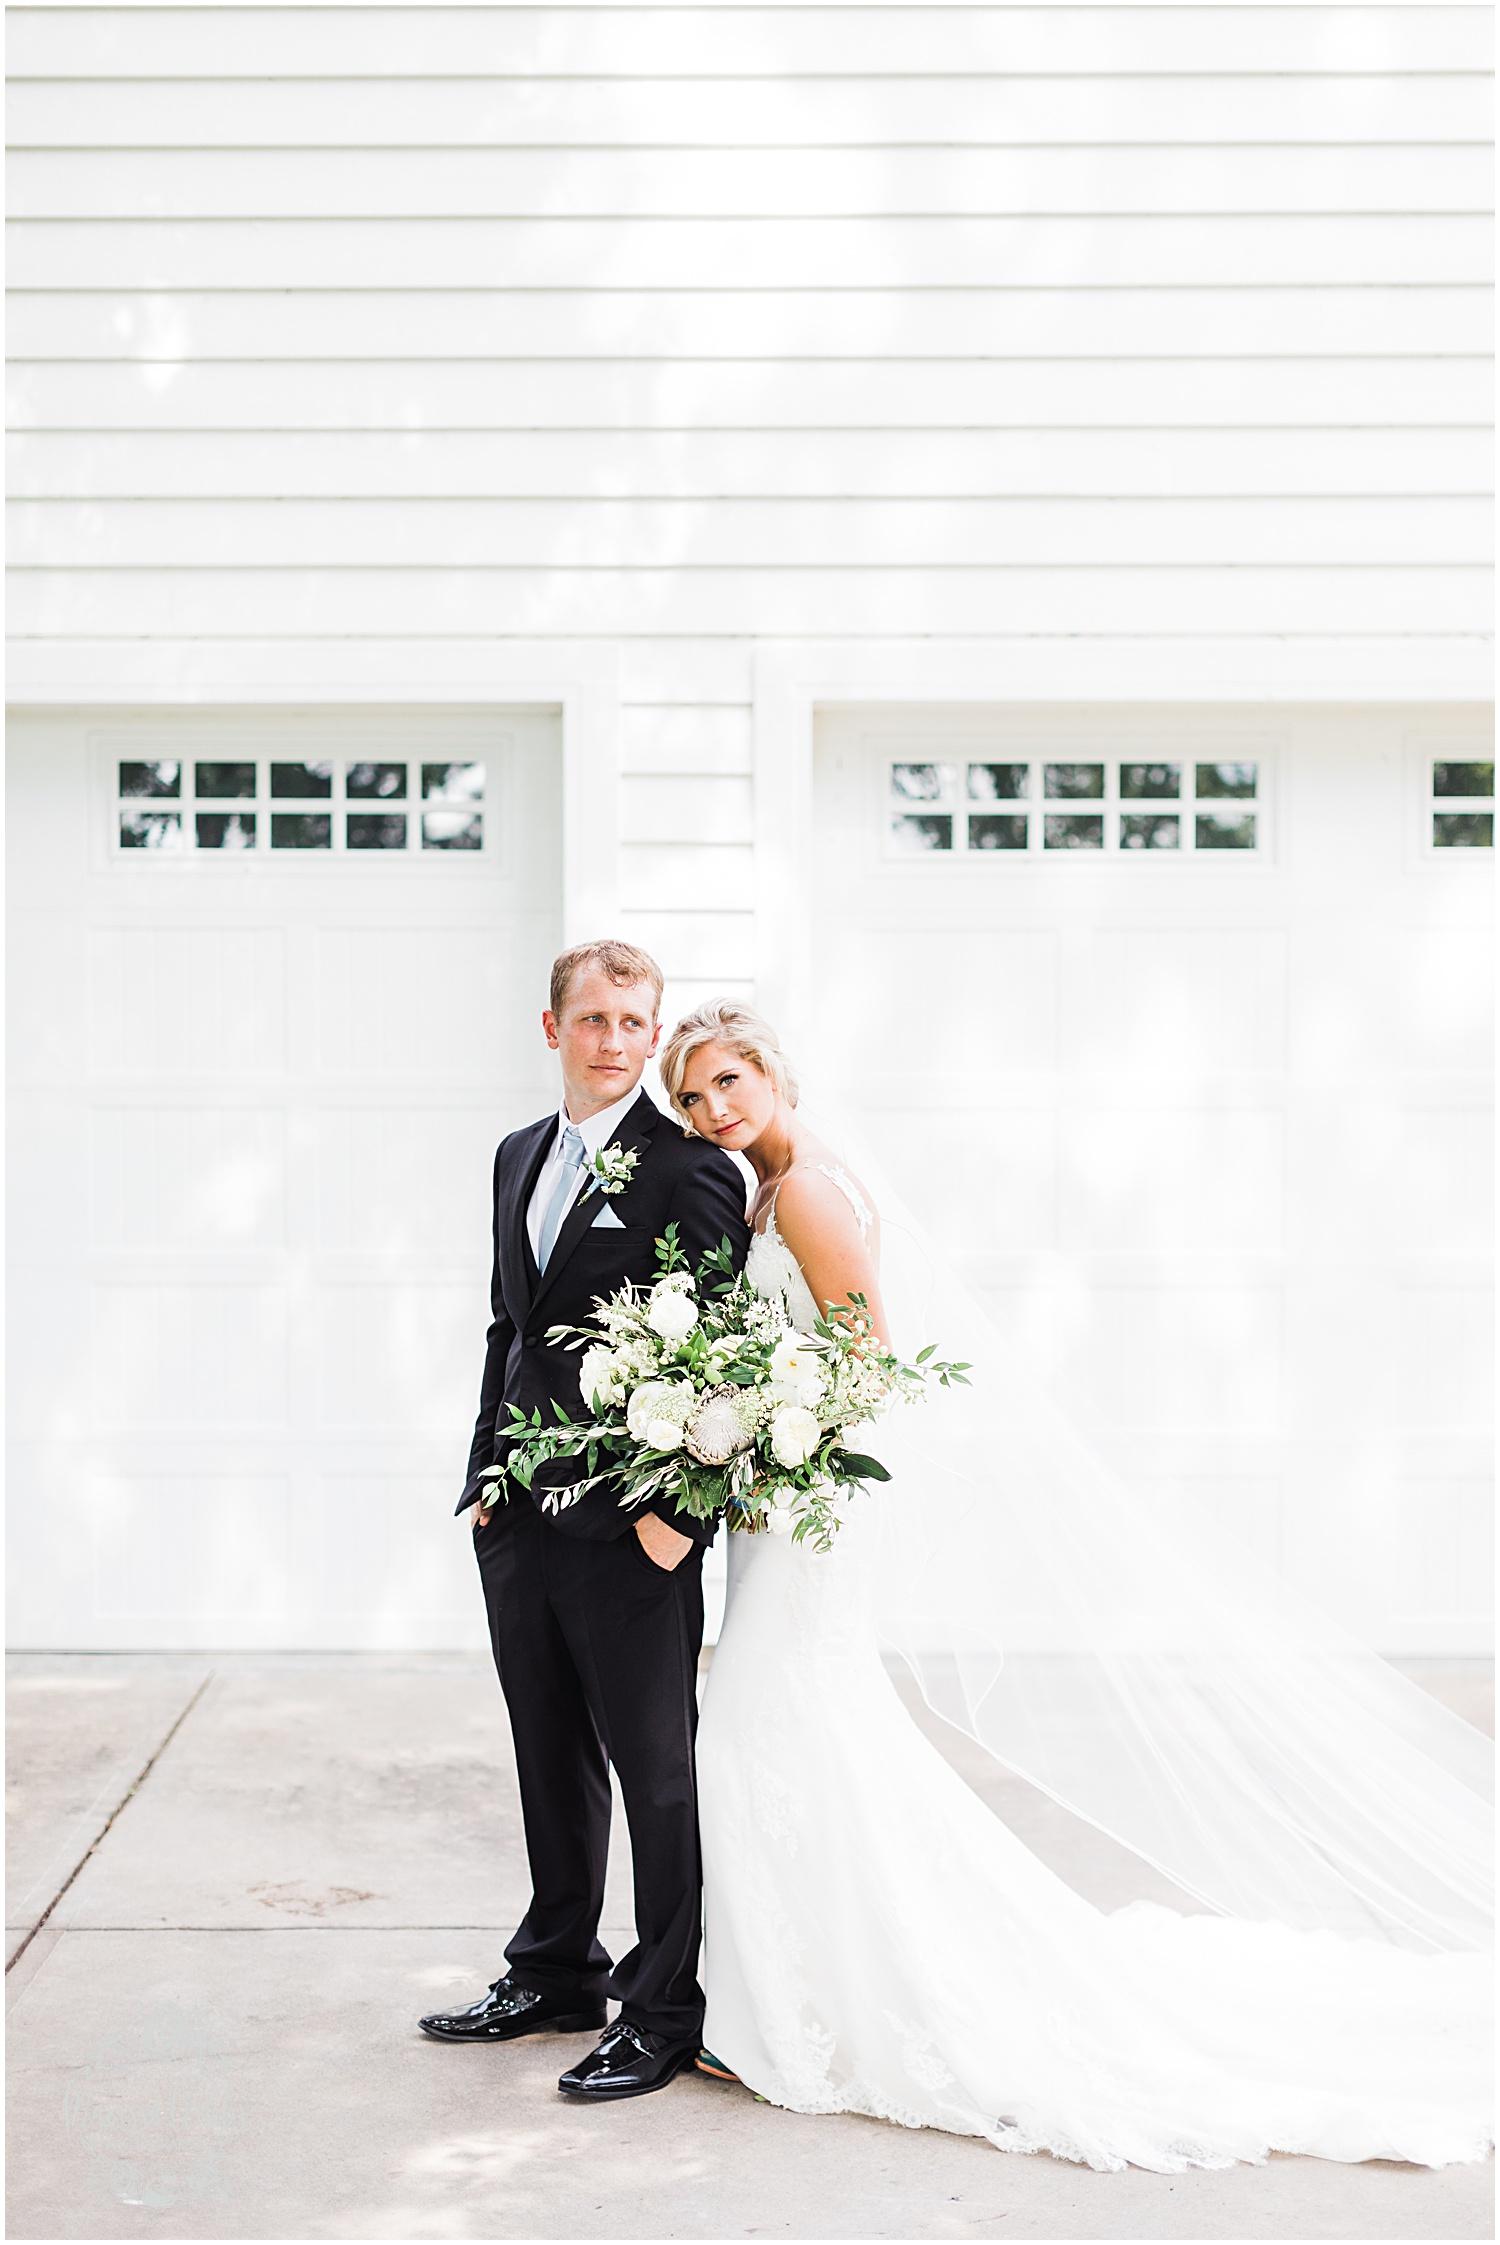 CHELSEA & BEN MARRIED BLOG  | MARISSA CRIBBS PHOTOGRAPHY_8573.jpg